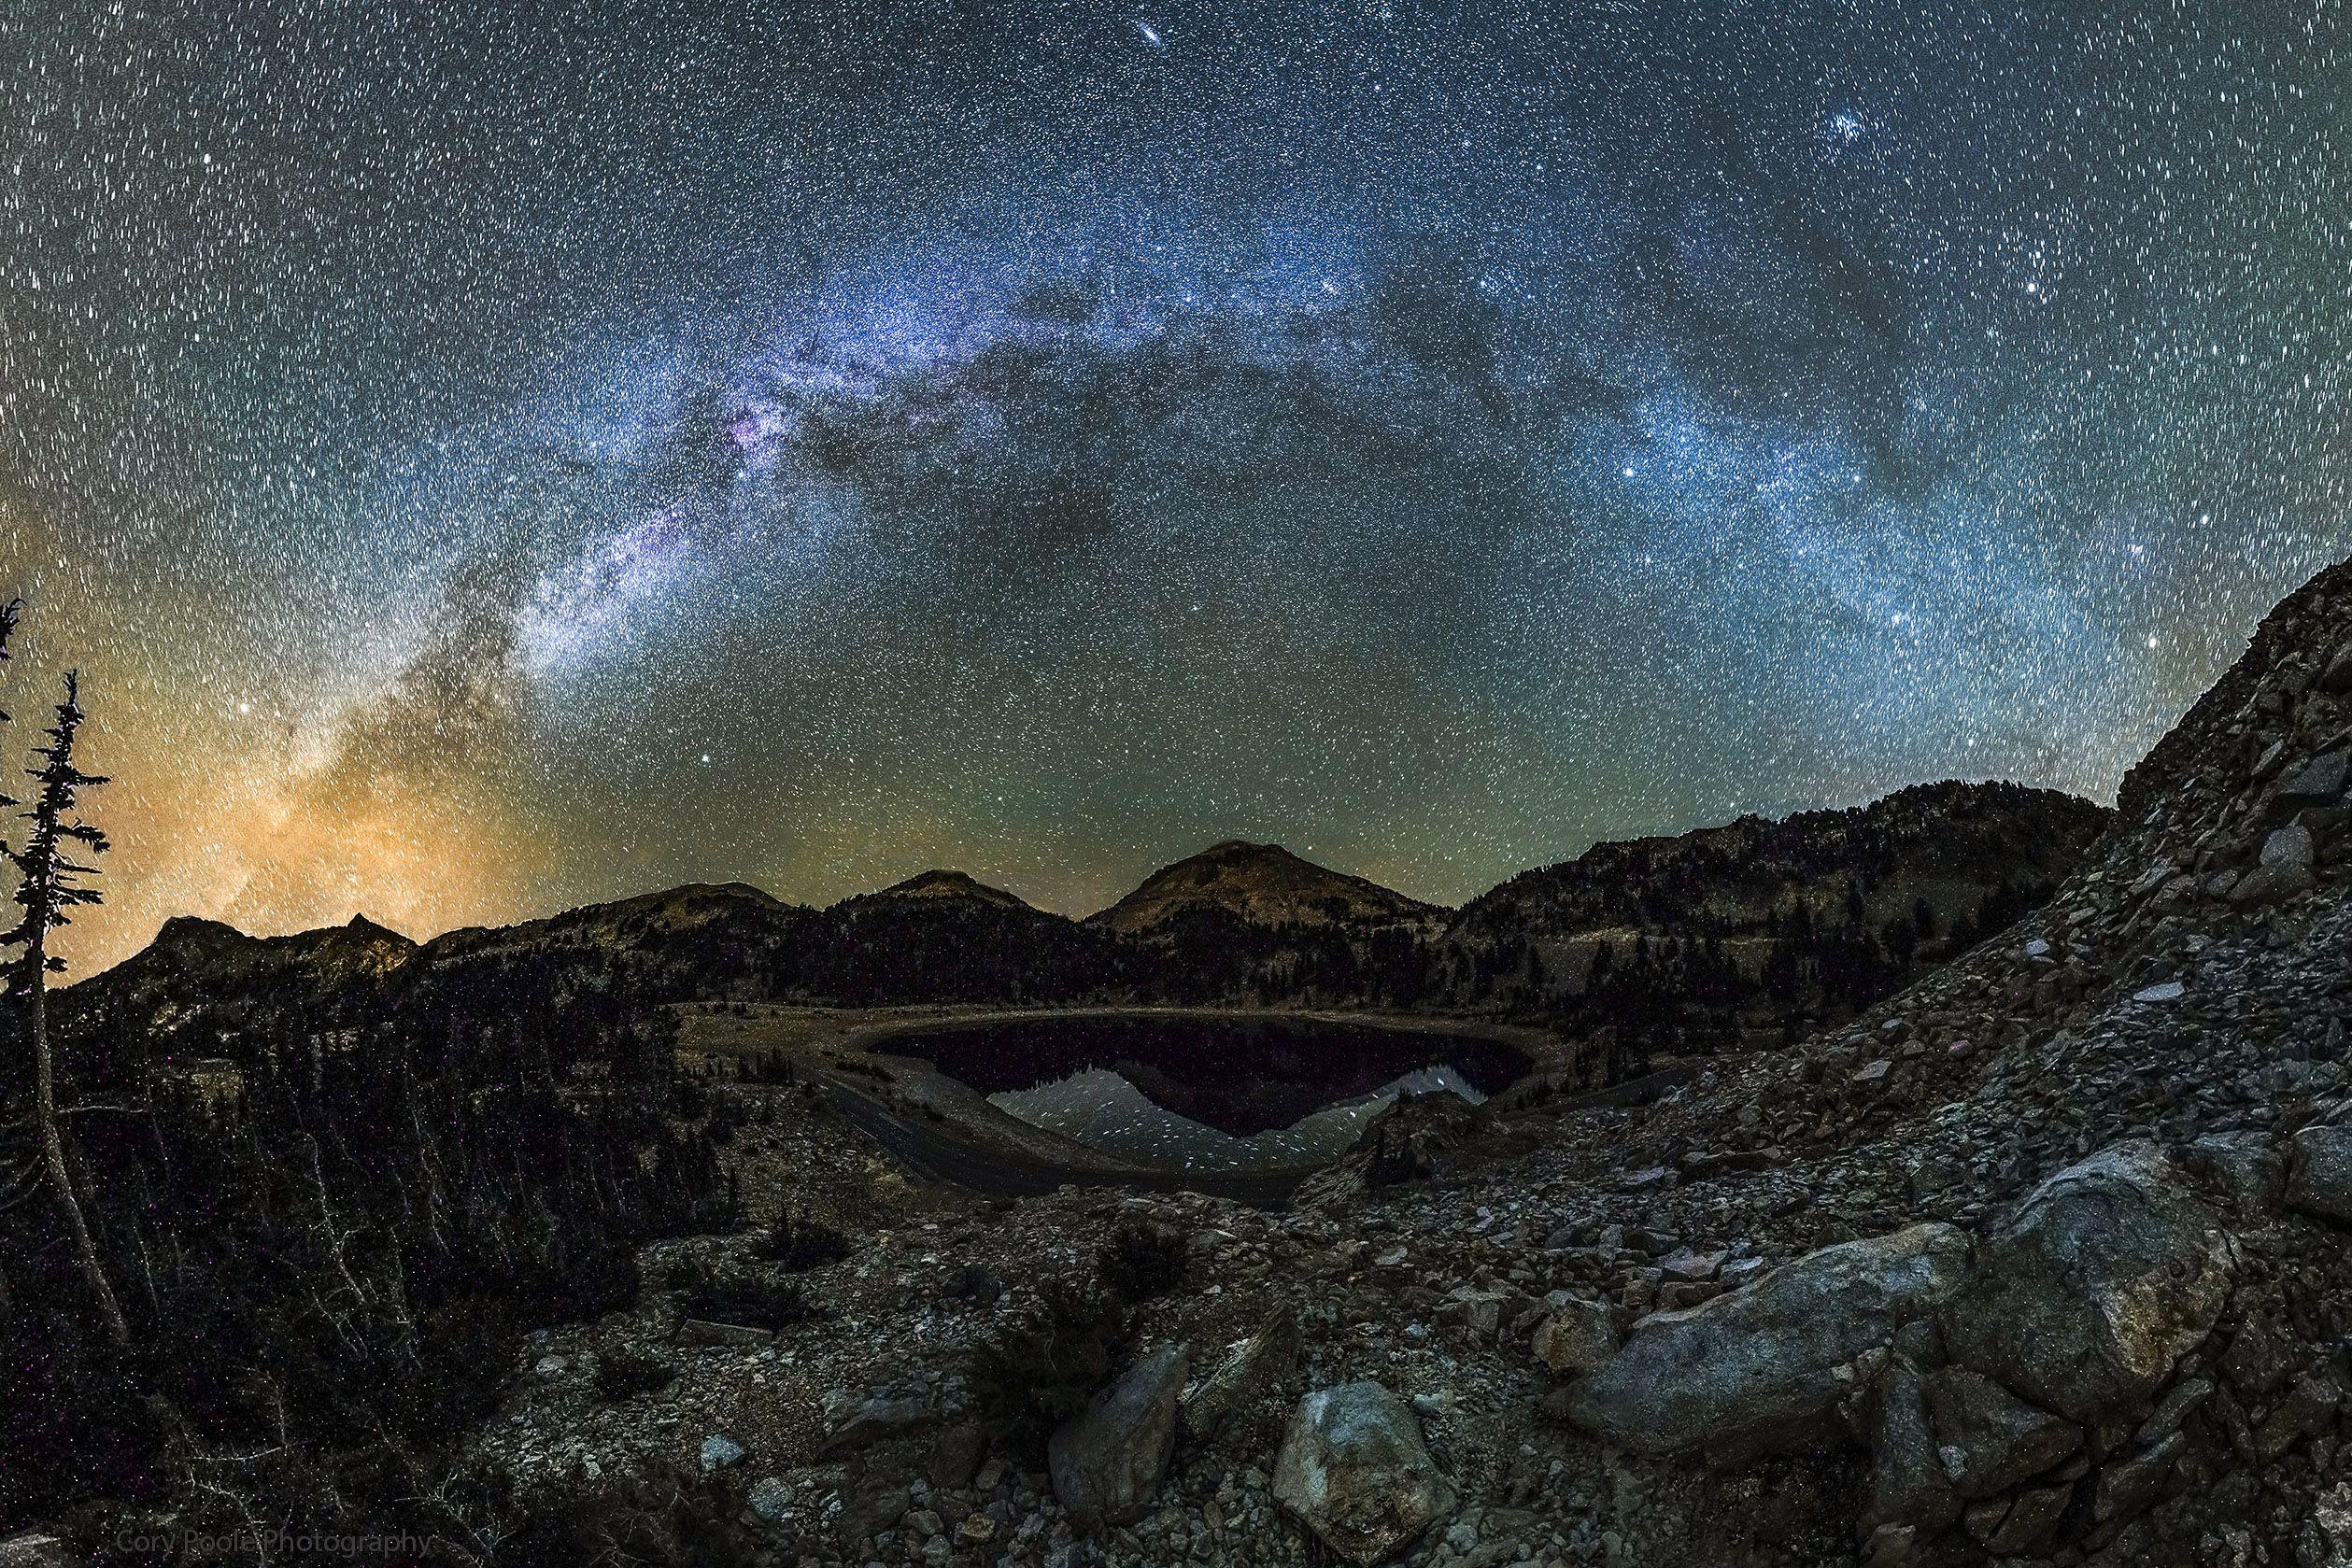 The Milky Way Lassen volcanic national park, Lake helen